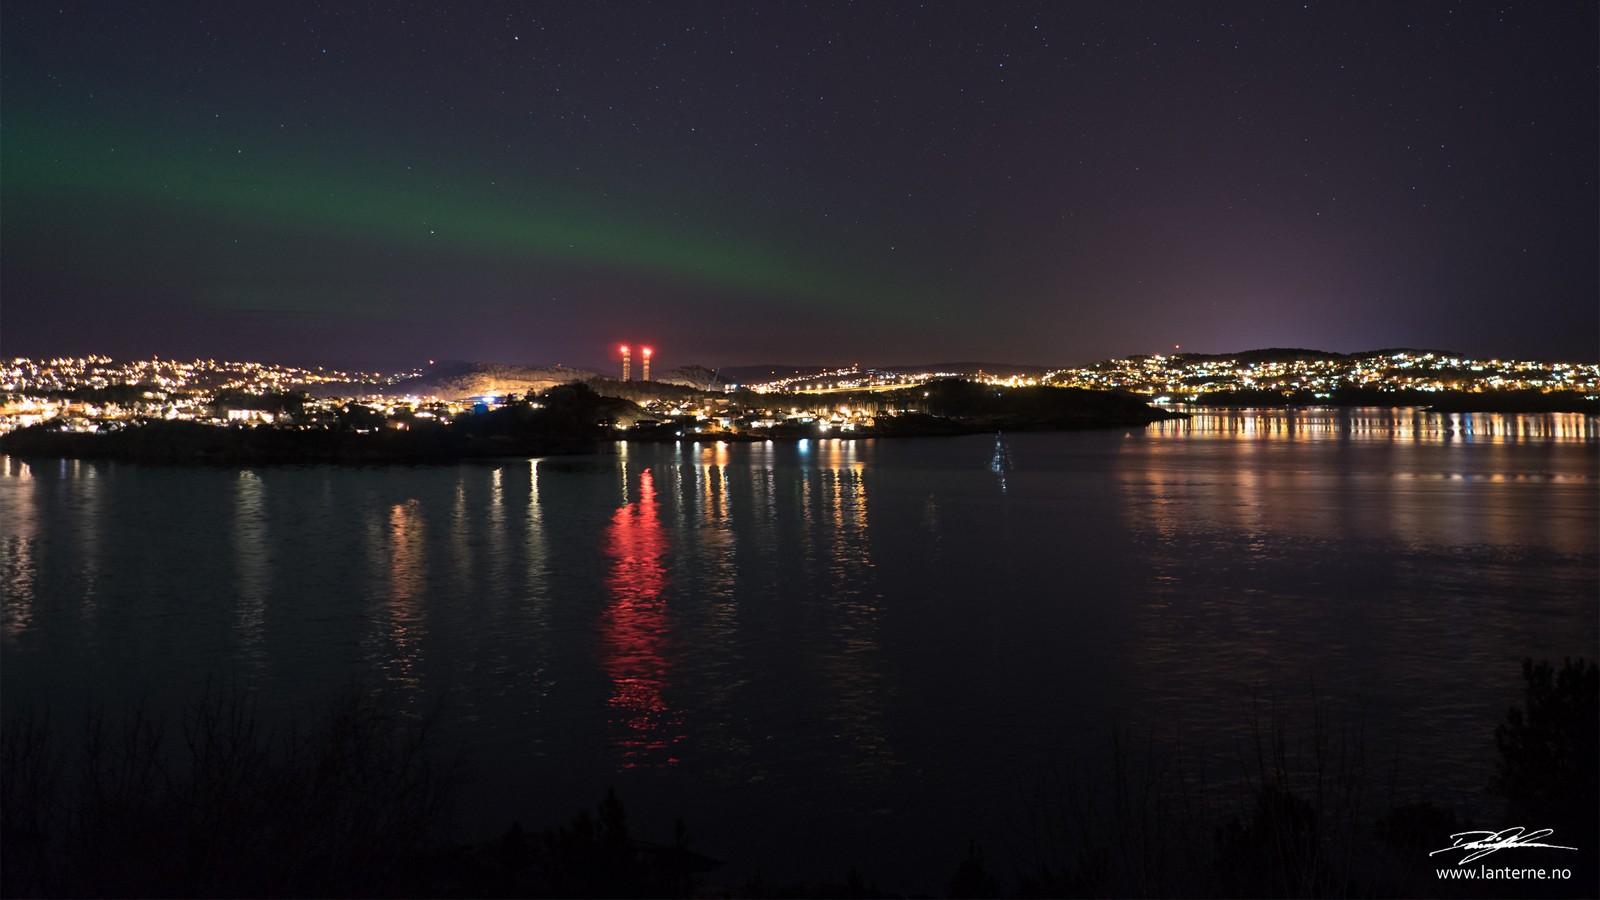 Her er fokus flyttet fra Kristiansand sentrum til Lund bydel, stadig tatt fra Odderøya.